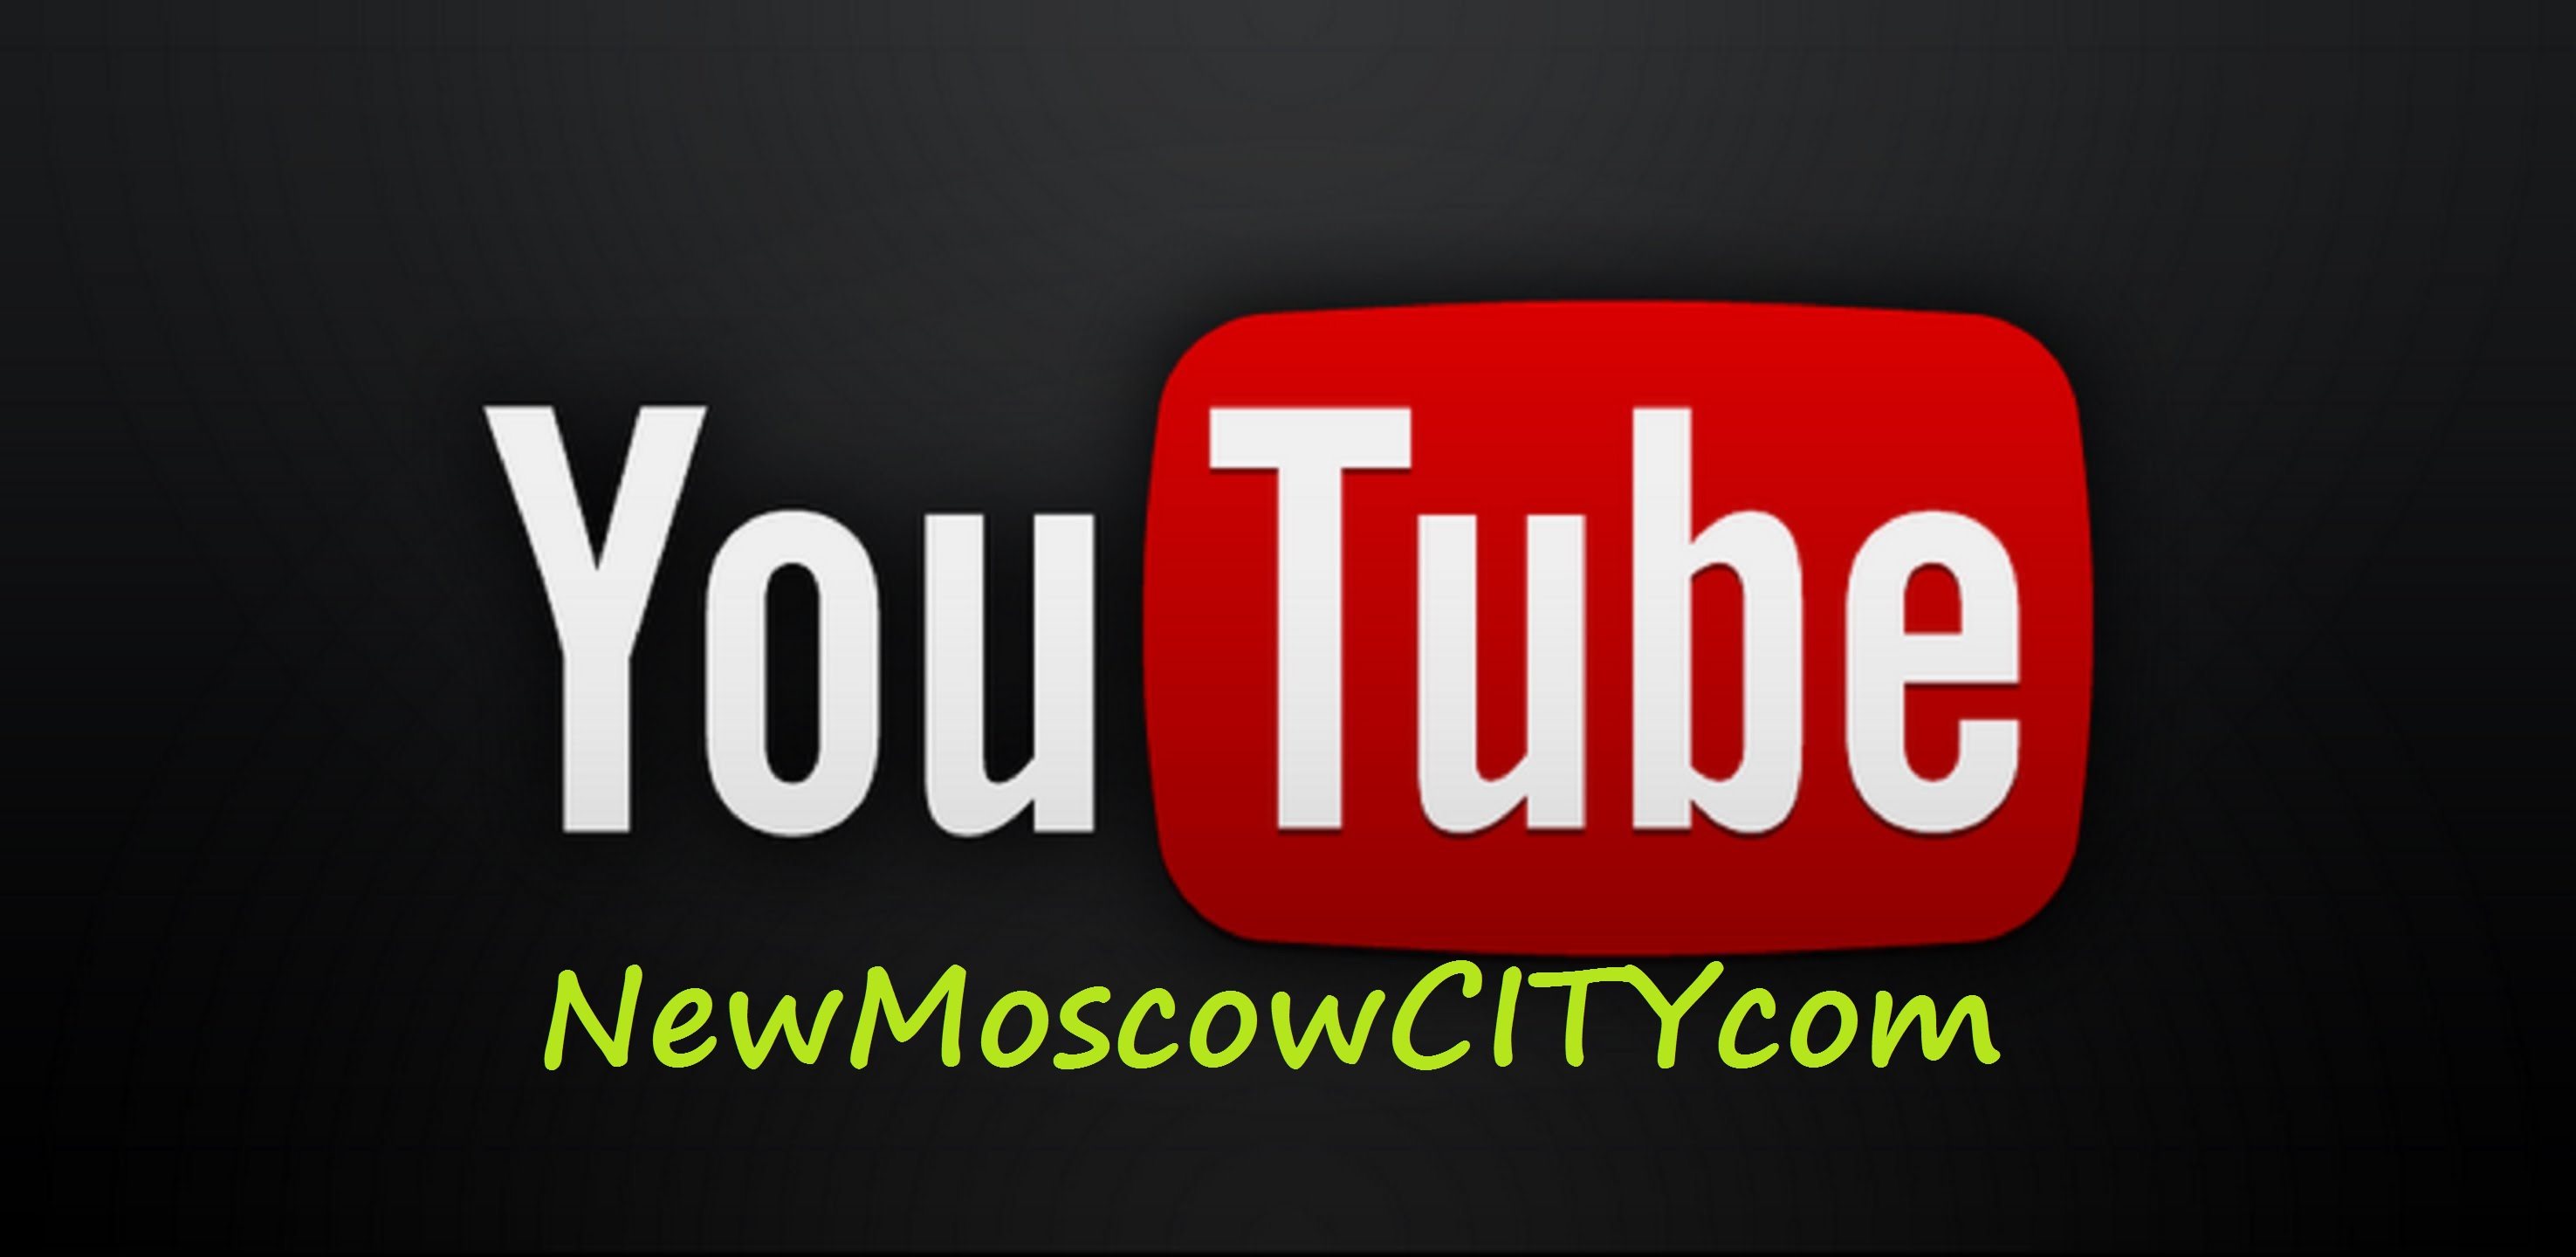 newmoscowcitycom